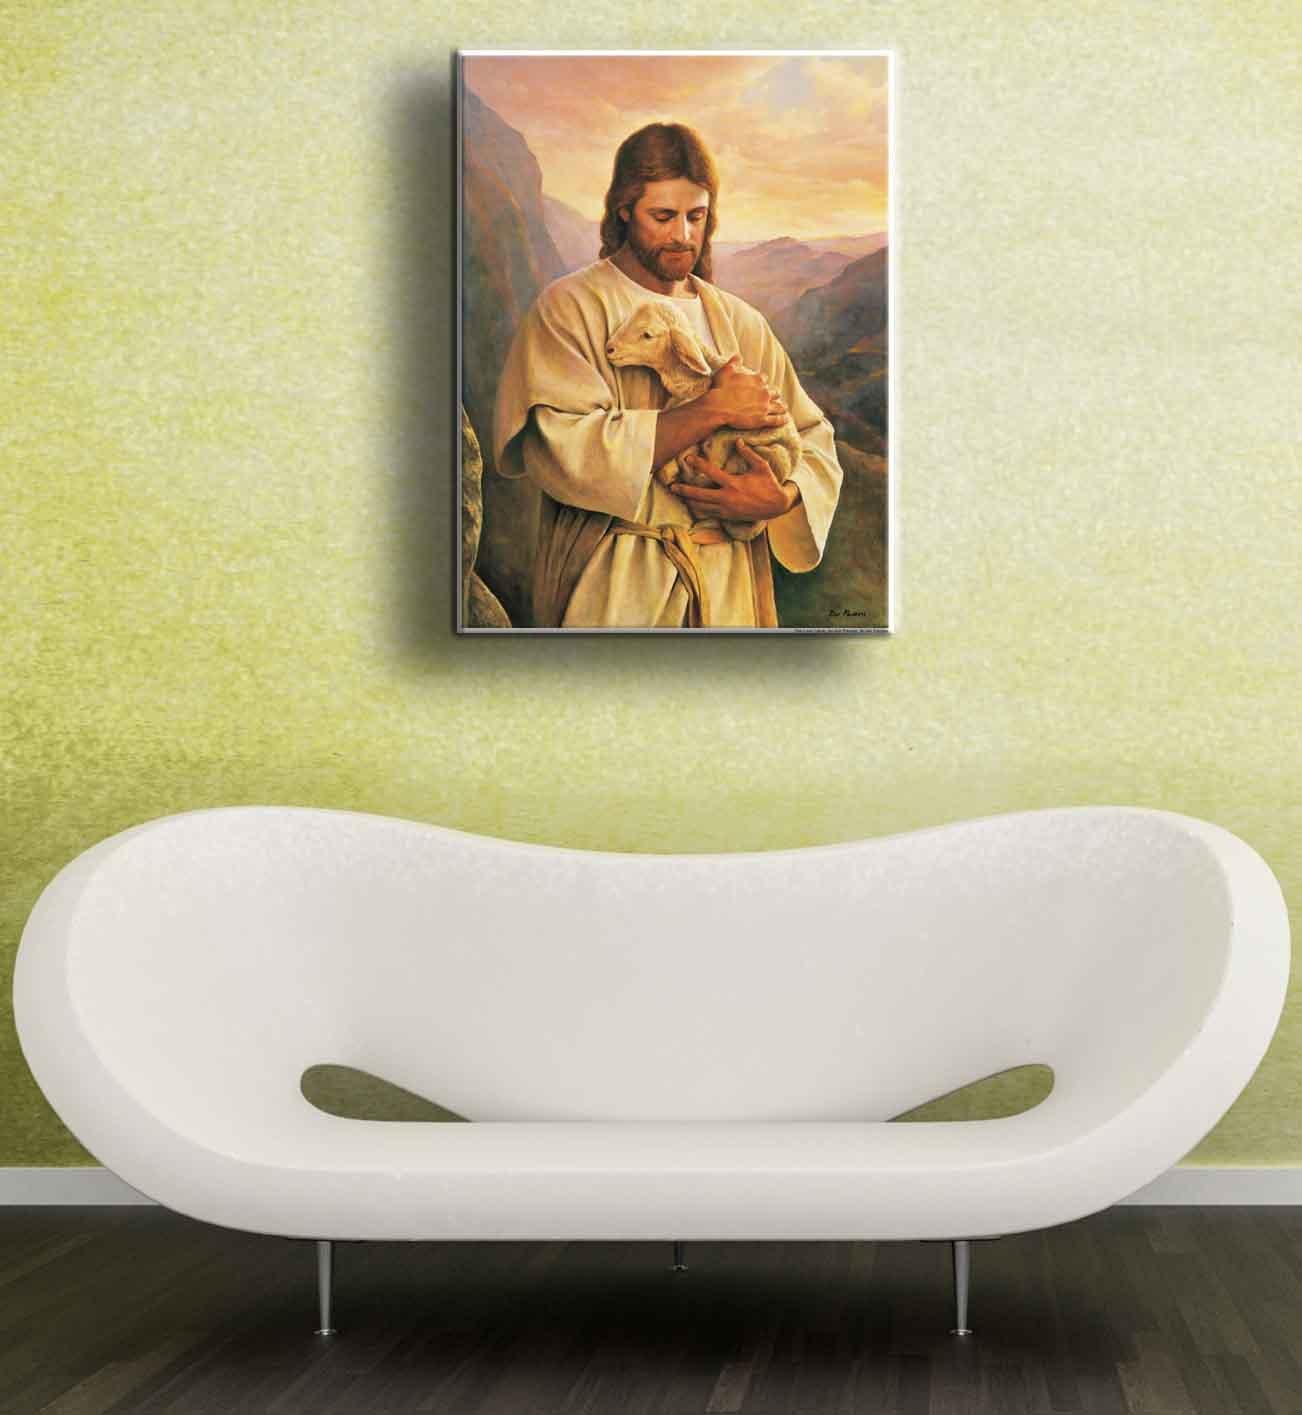 Amazon.com: SmartWallArt - Religious Spiritual Beliefs Paintings ...